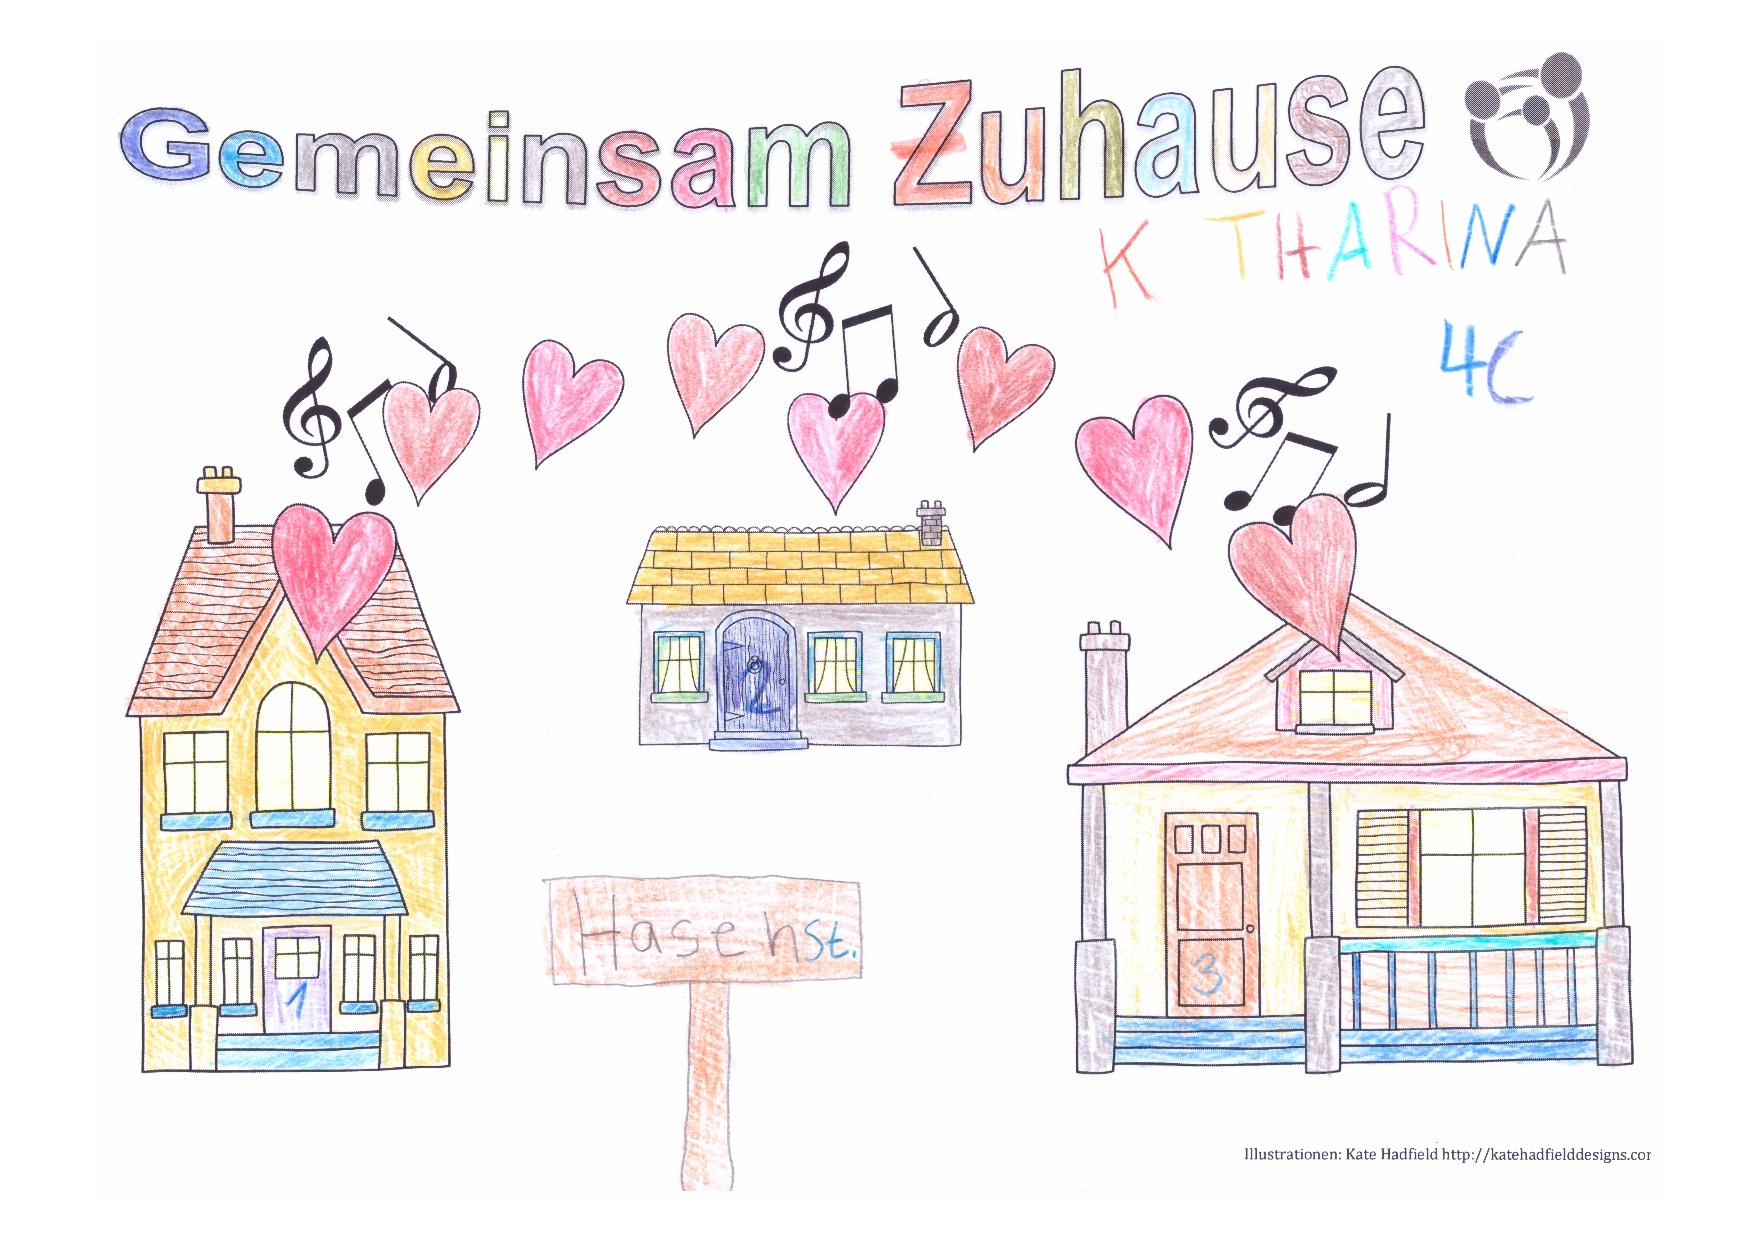 Gemeinsam Zuhause_Katharina Sistermann_4